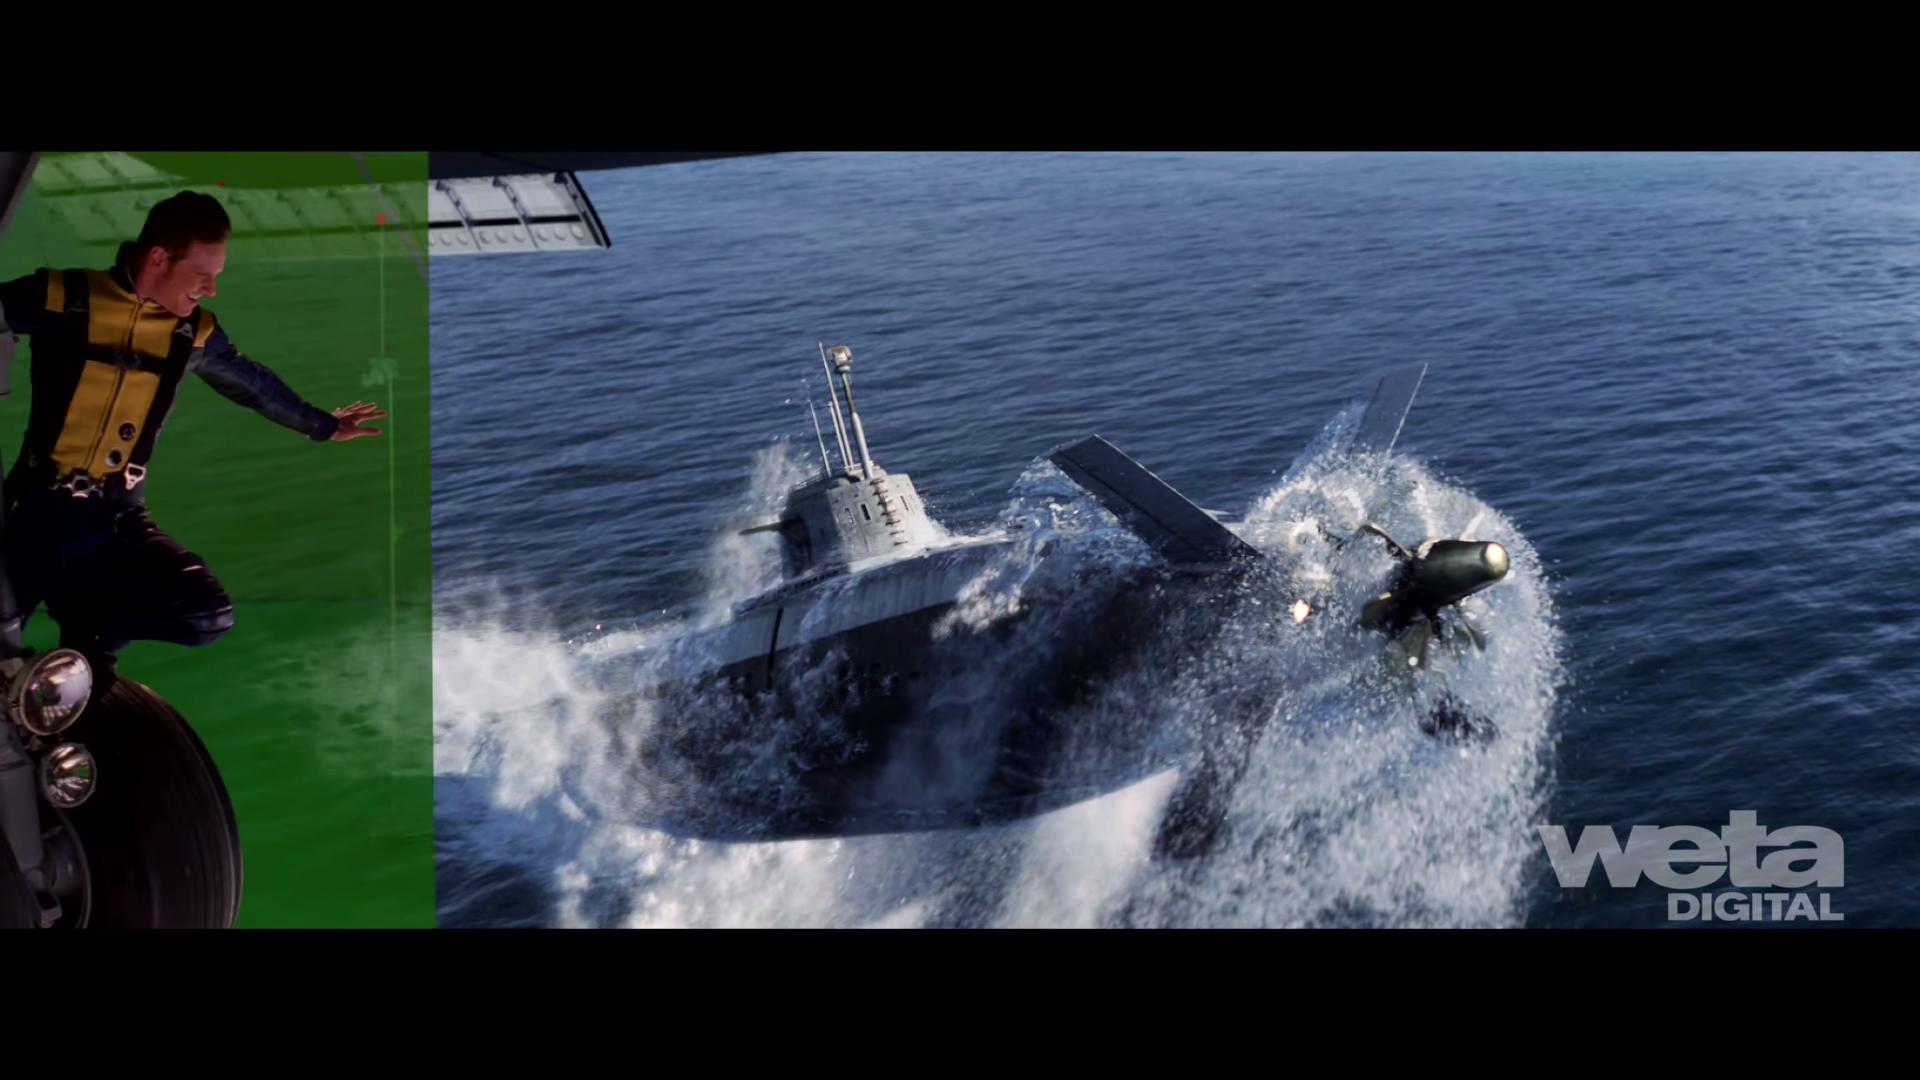 Weta Digital is posting a heap of VFX breakdowns right now